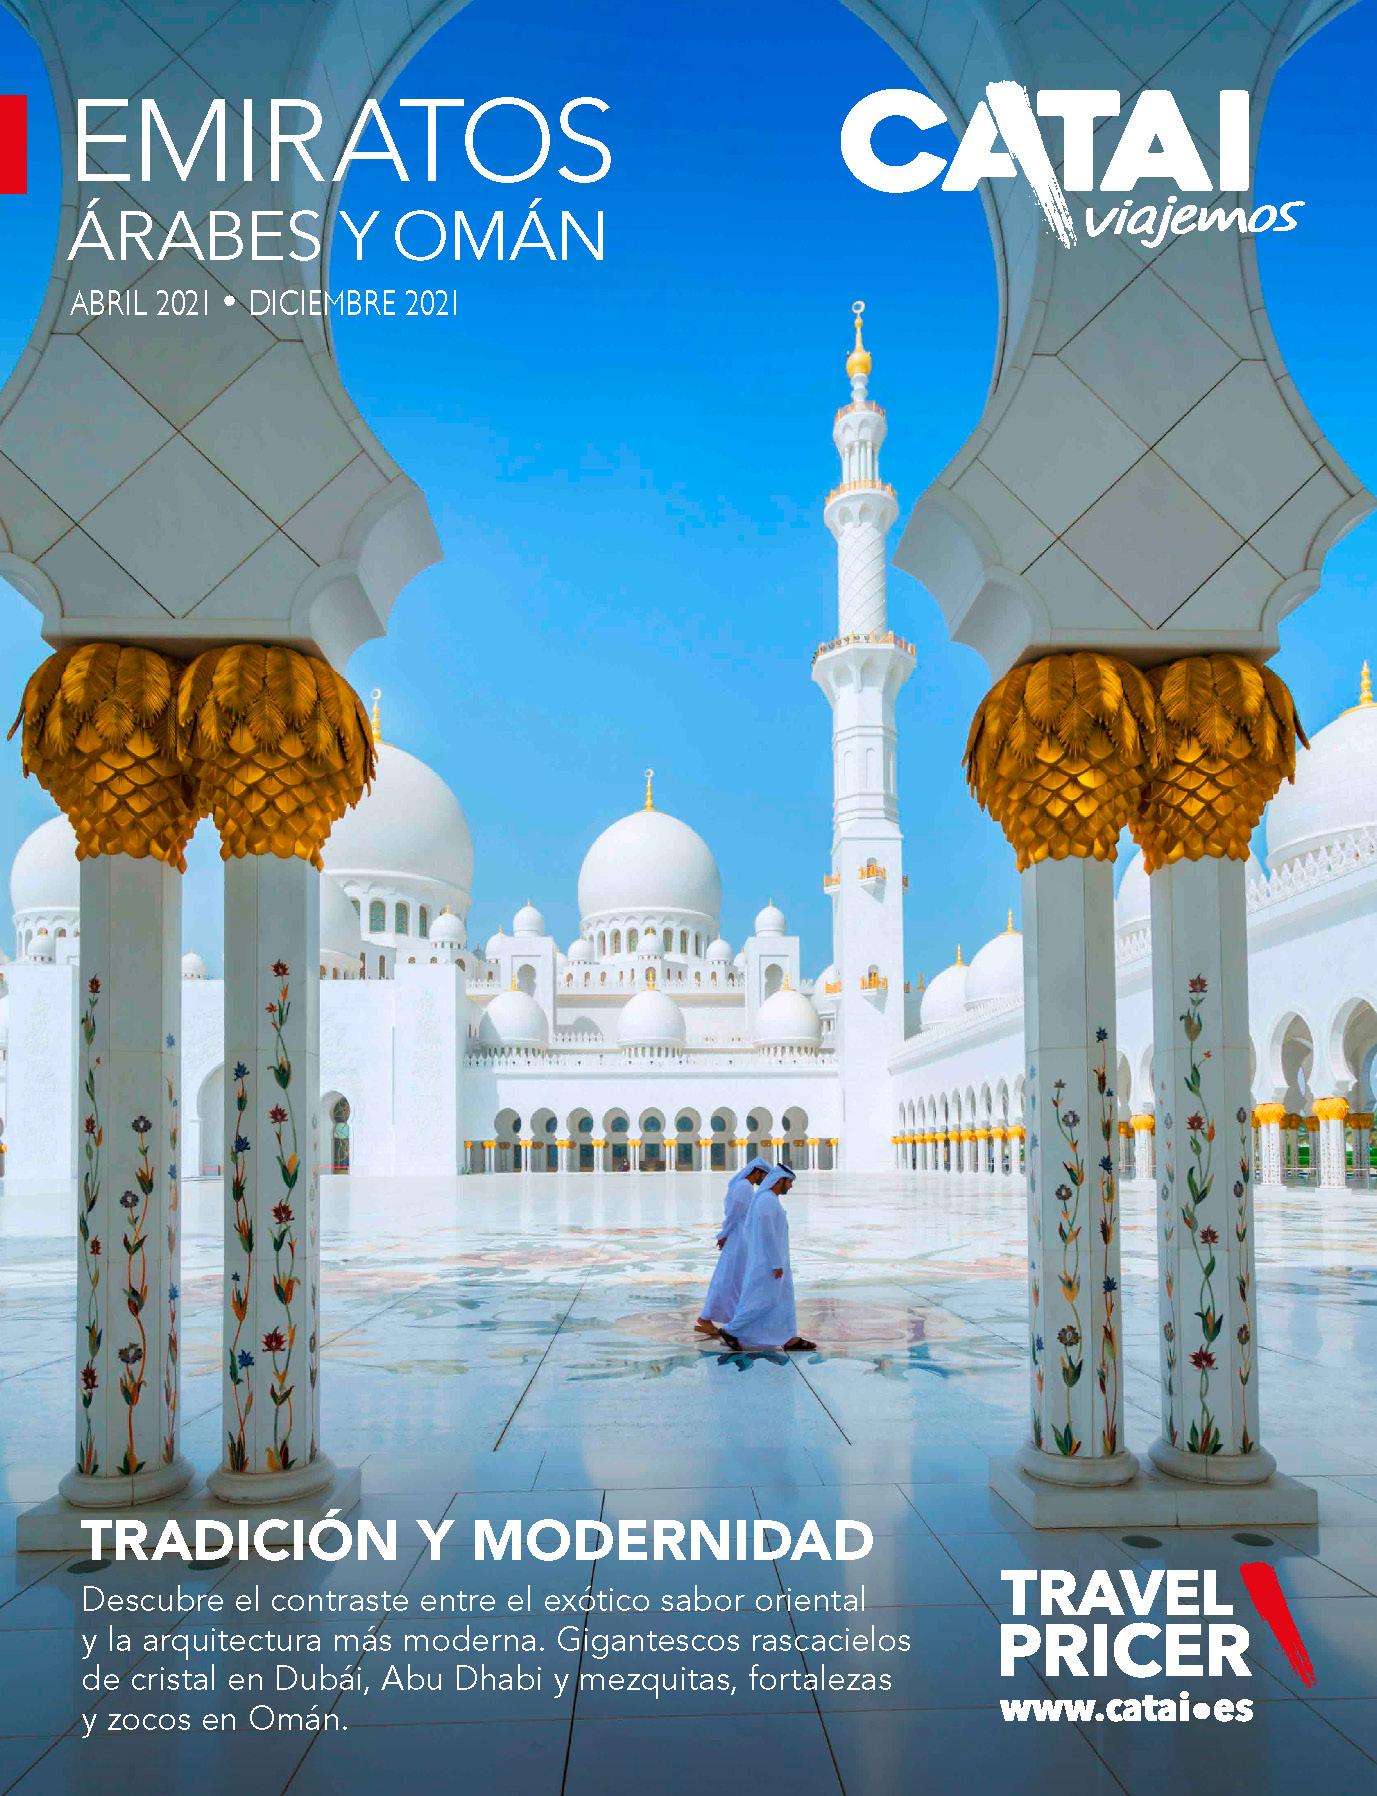 Catalogo Catai Emiratos Arabes y Oman 2021